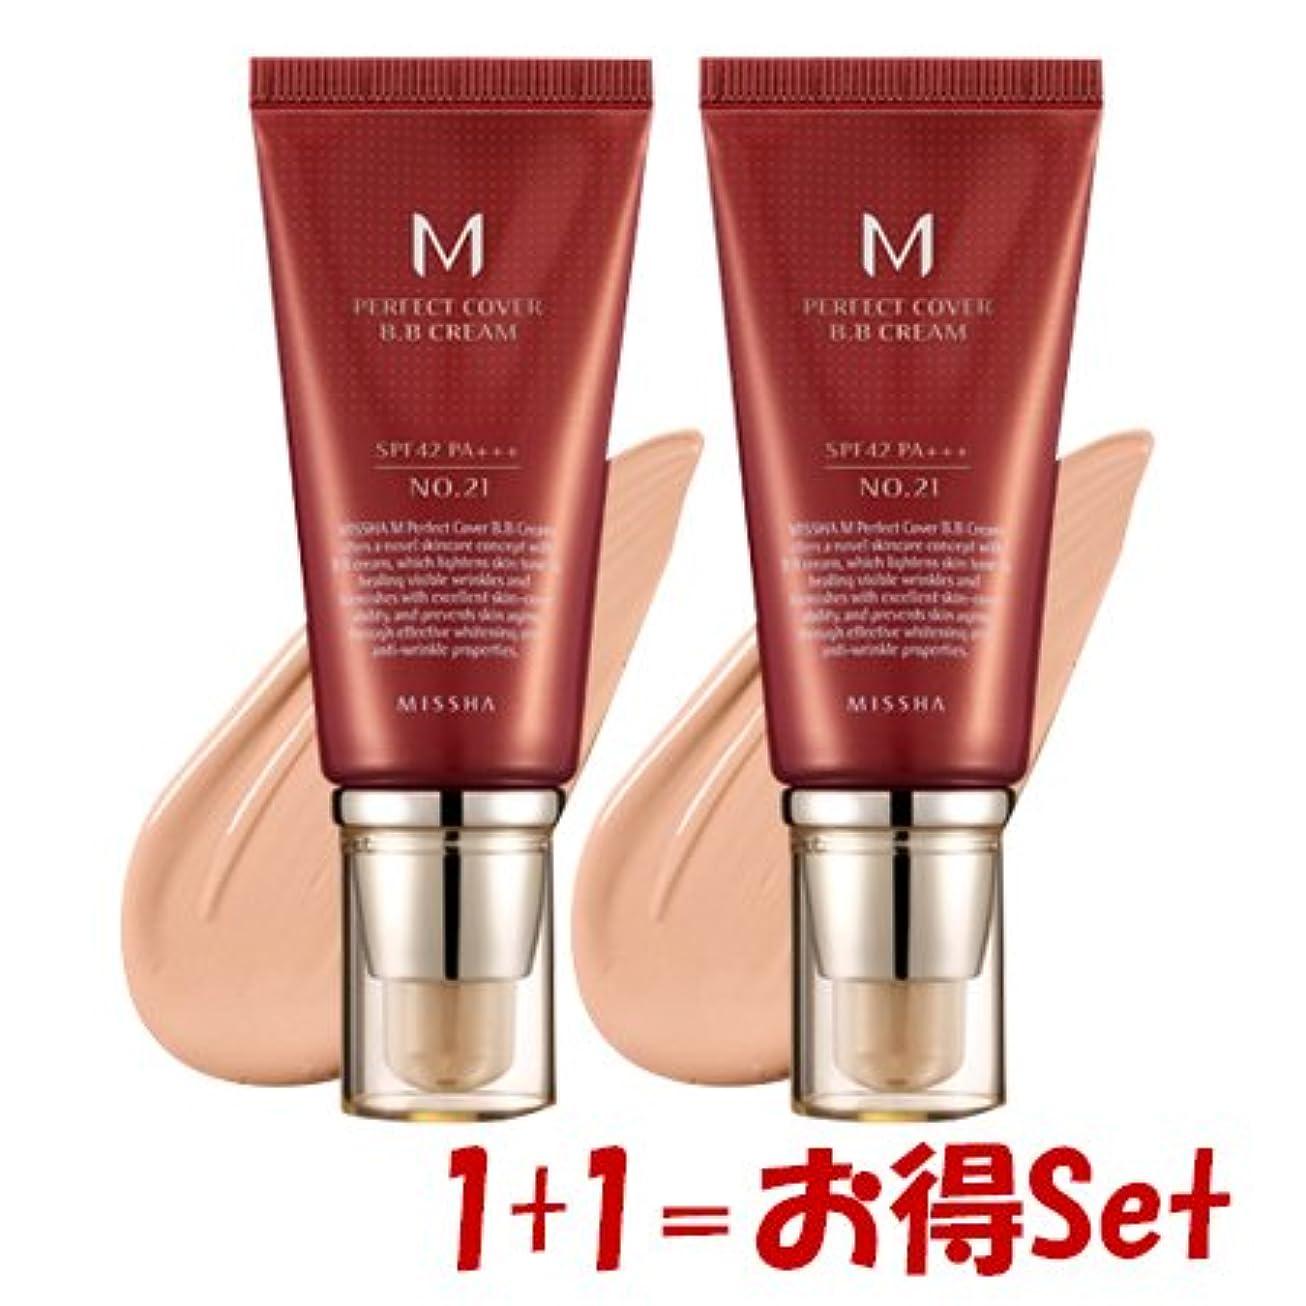 Missha(ミシャ) ミシャ M BBクリーム UV SPF42/PA+++ #21 50ml×2個セット [並行輸入品][海外直送品]